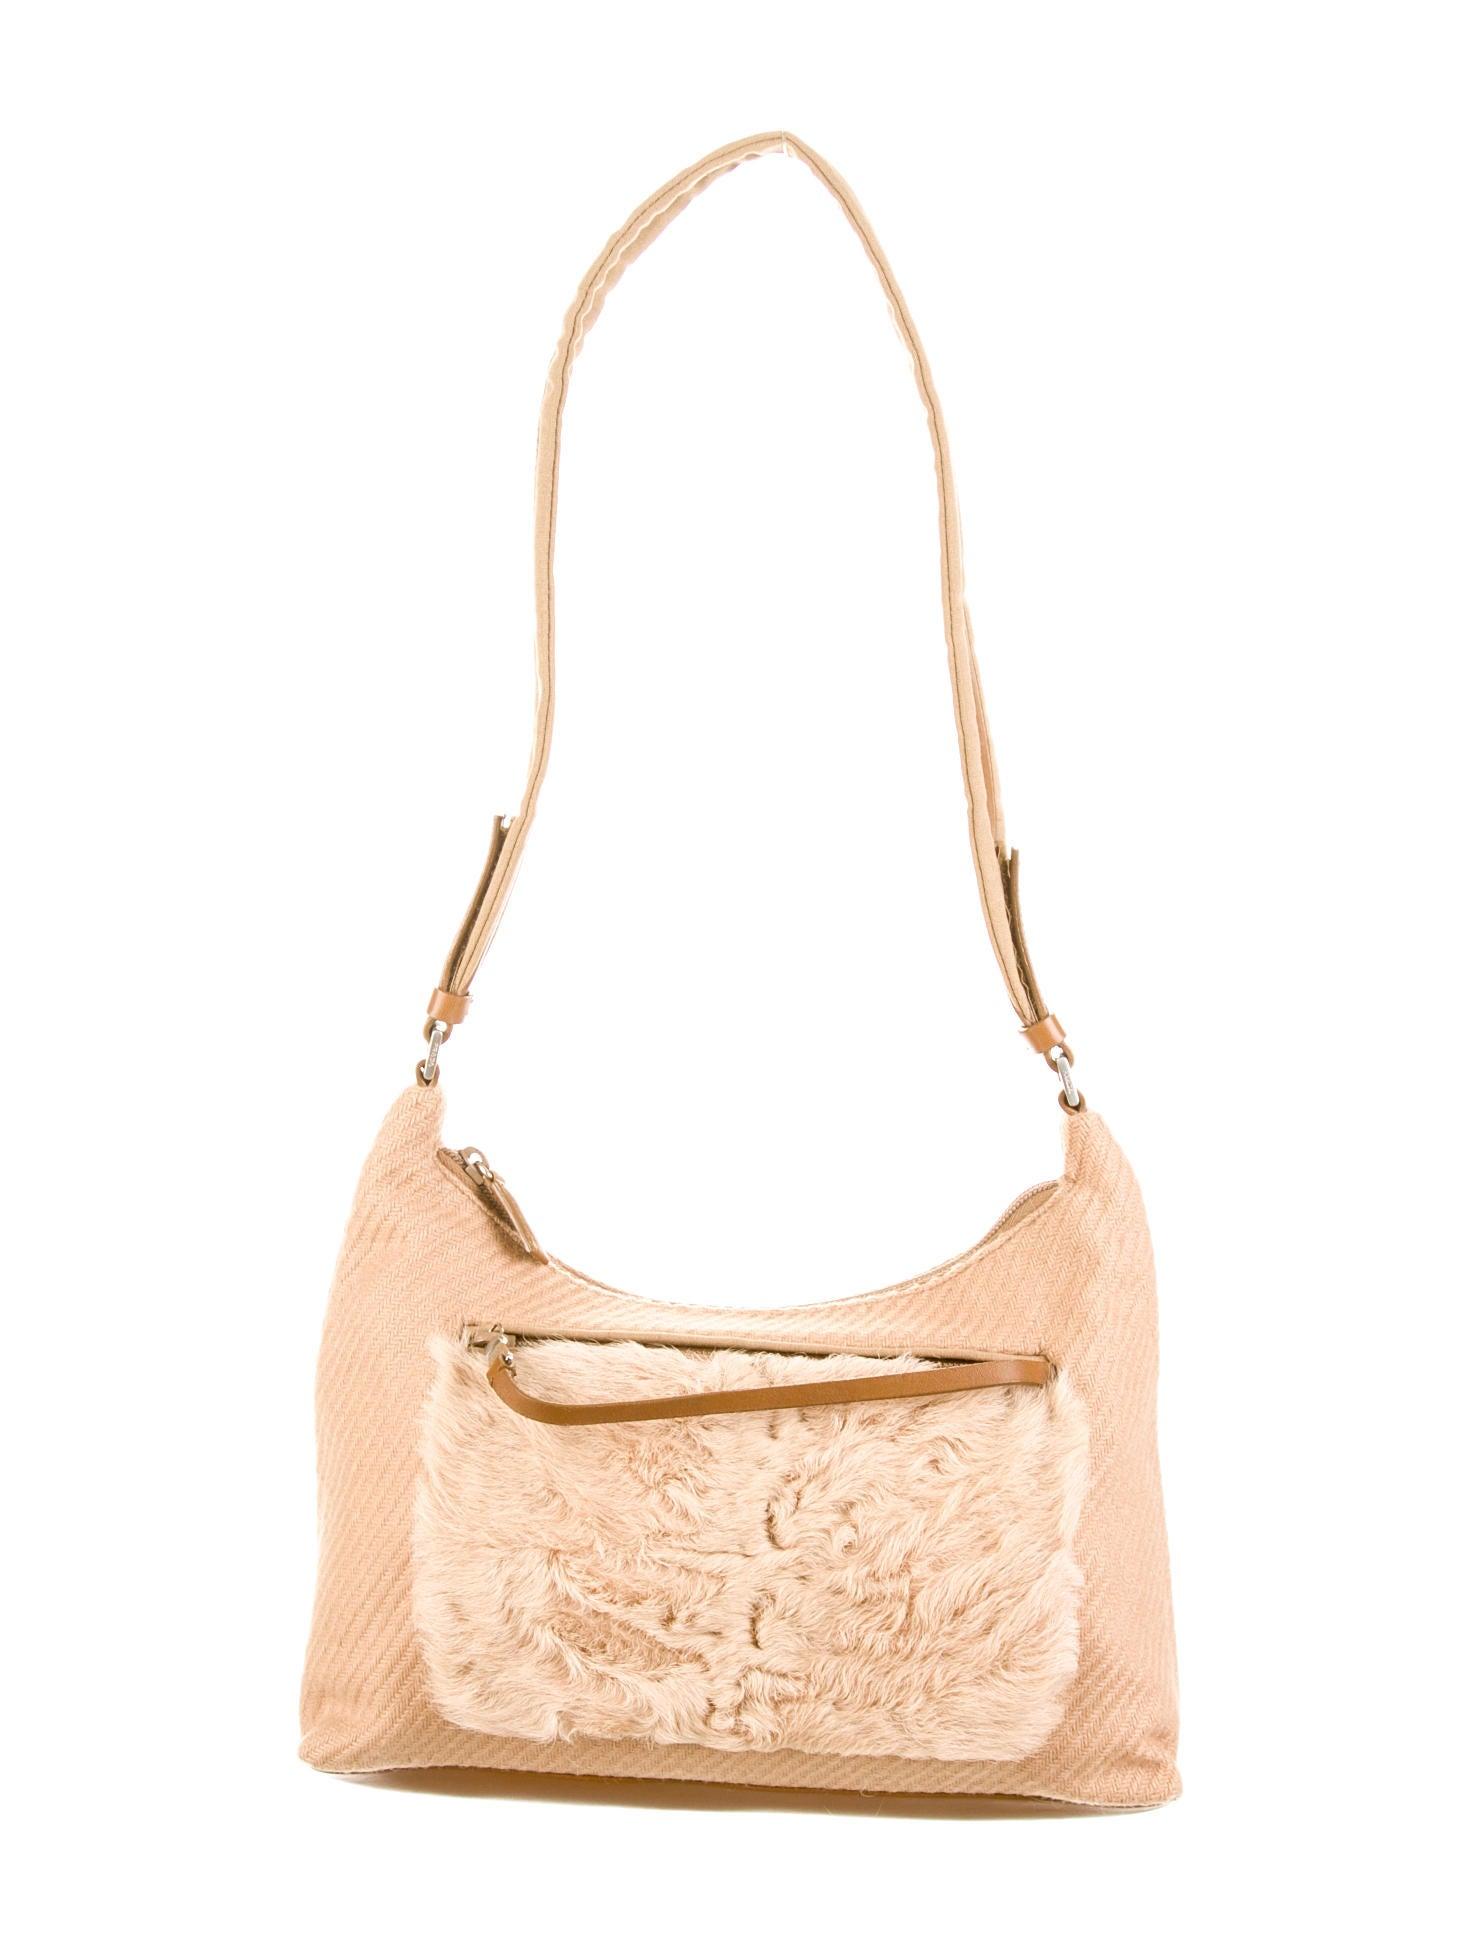 Prada Shoulder Bag - Handbags - PRA57558 | The RealReal